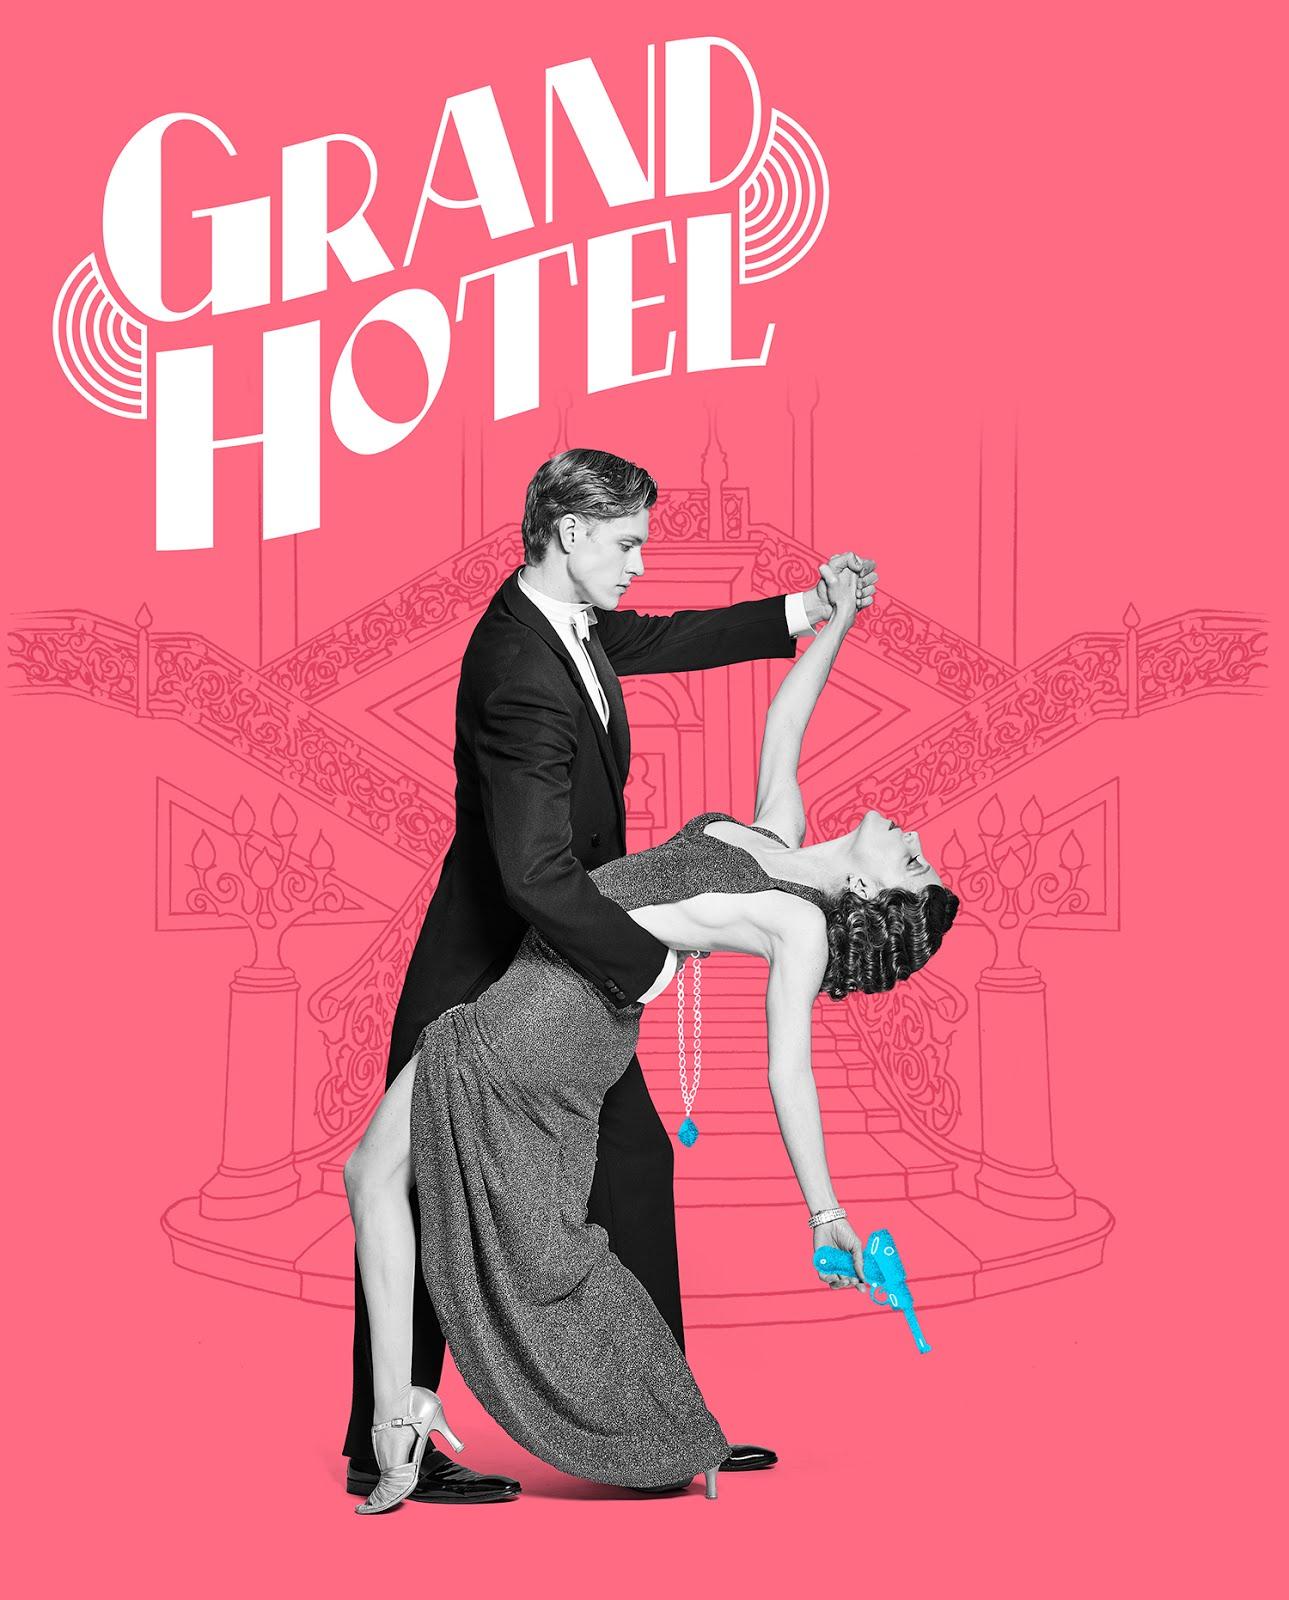 Shaw 2018 - Grand Hotel